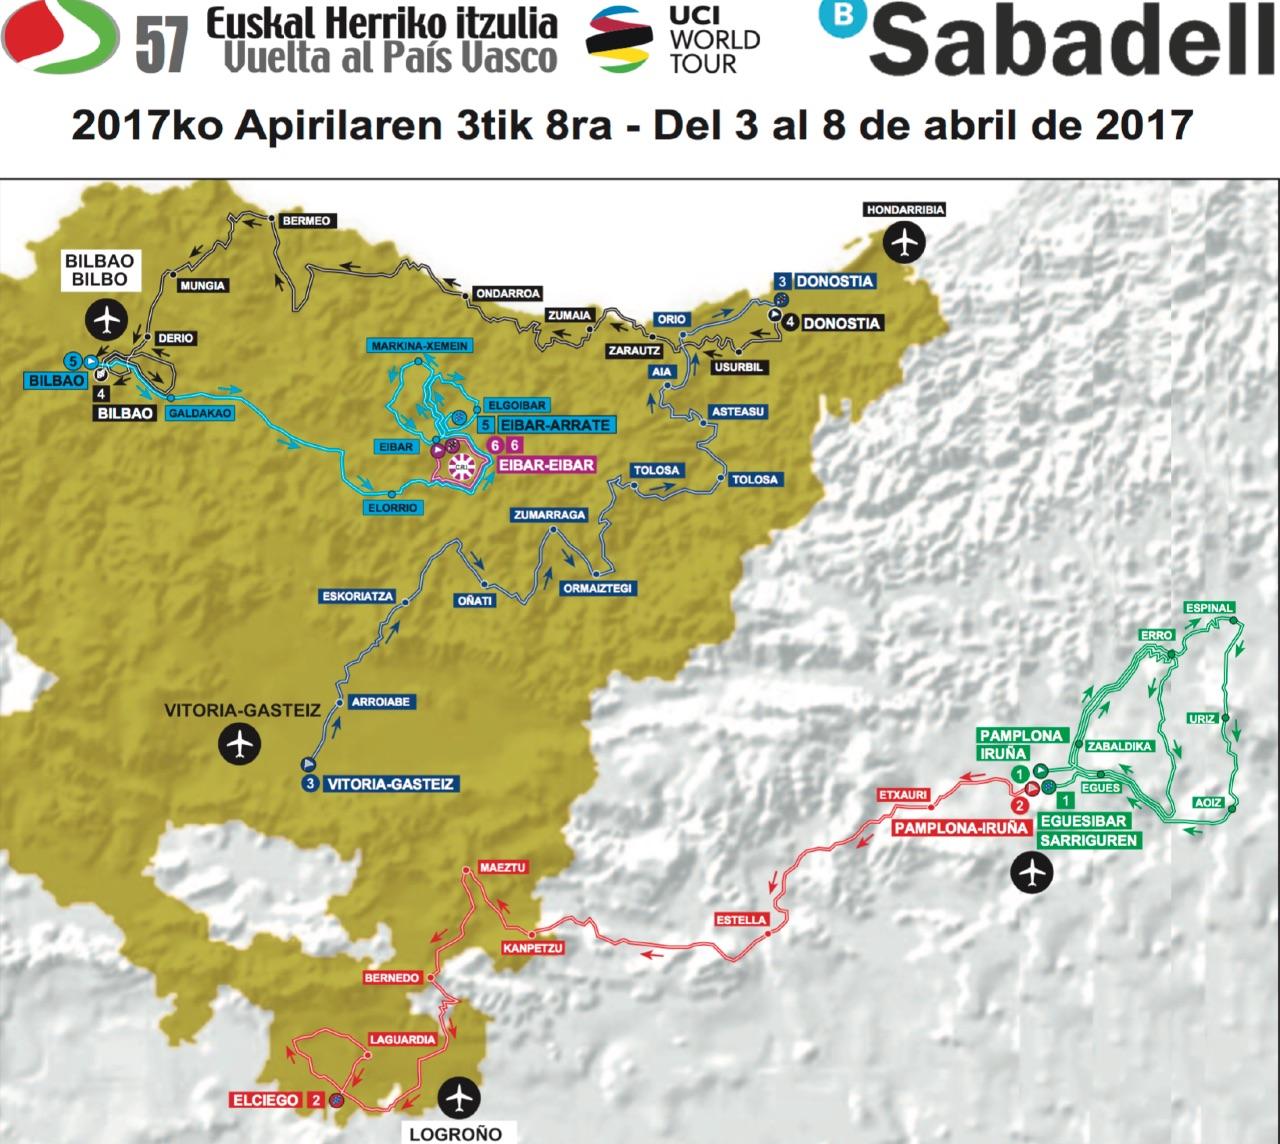 Vuelta Al Pais Vasco